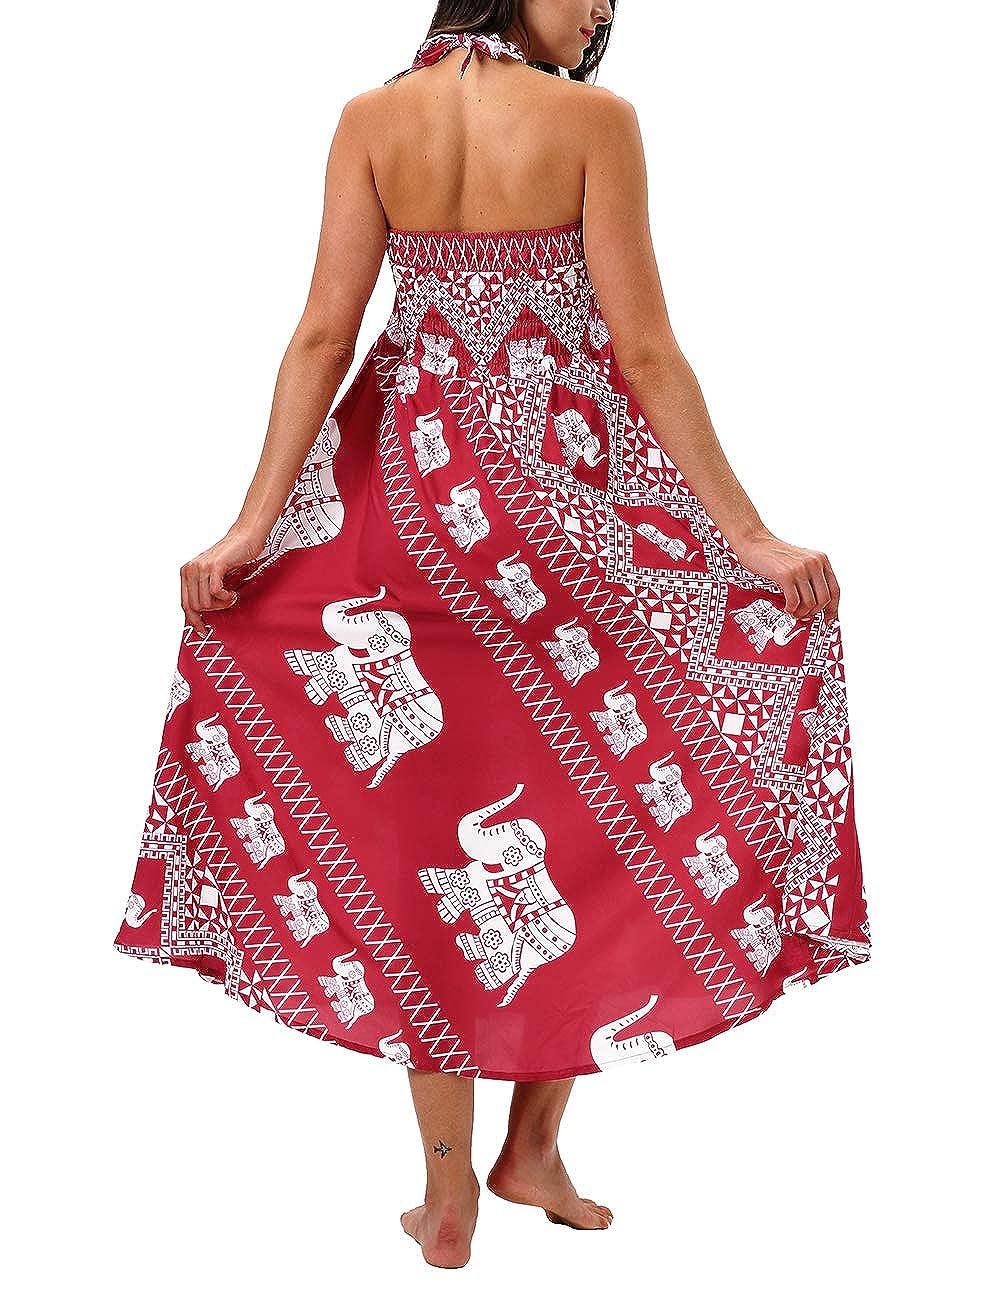 SEBOWEL Women Printed Beach Dress Skirts Bikini Swimwear Cover Ups Kaftan